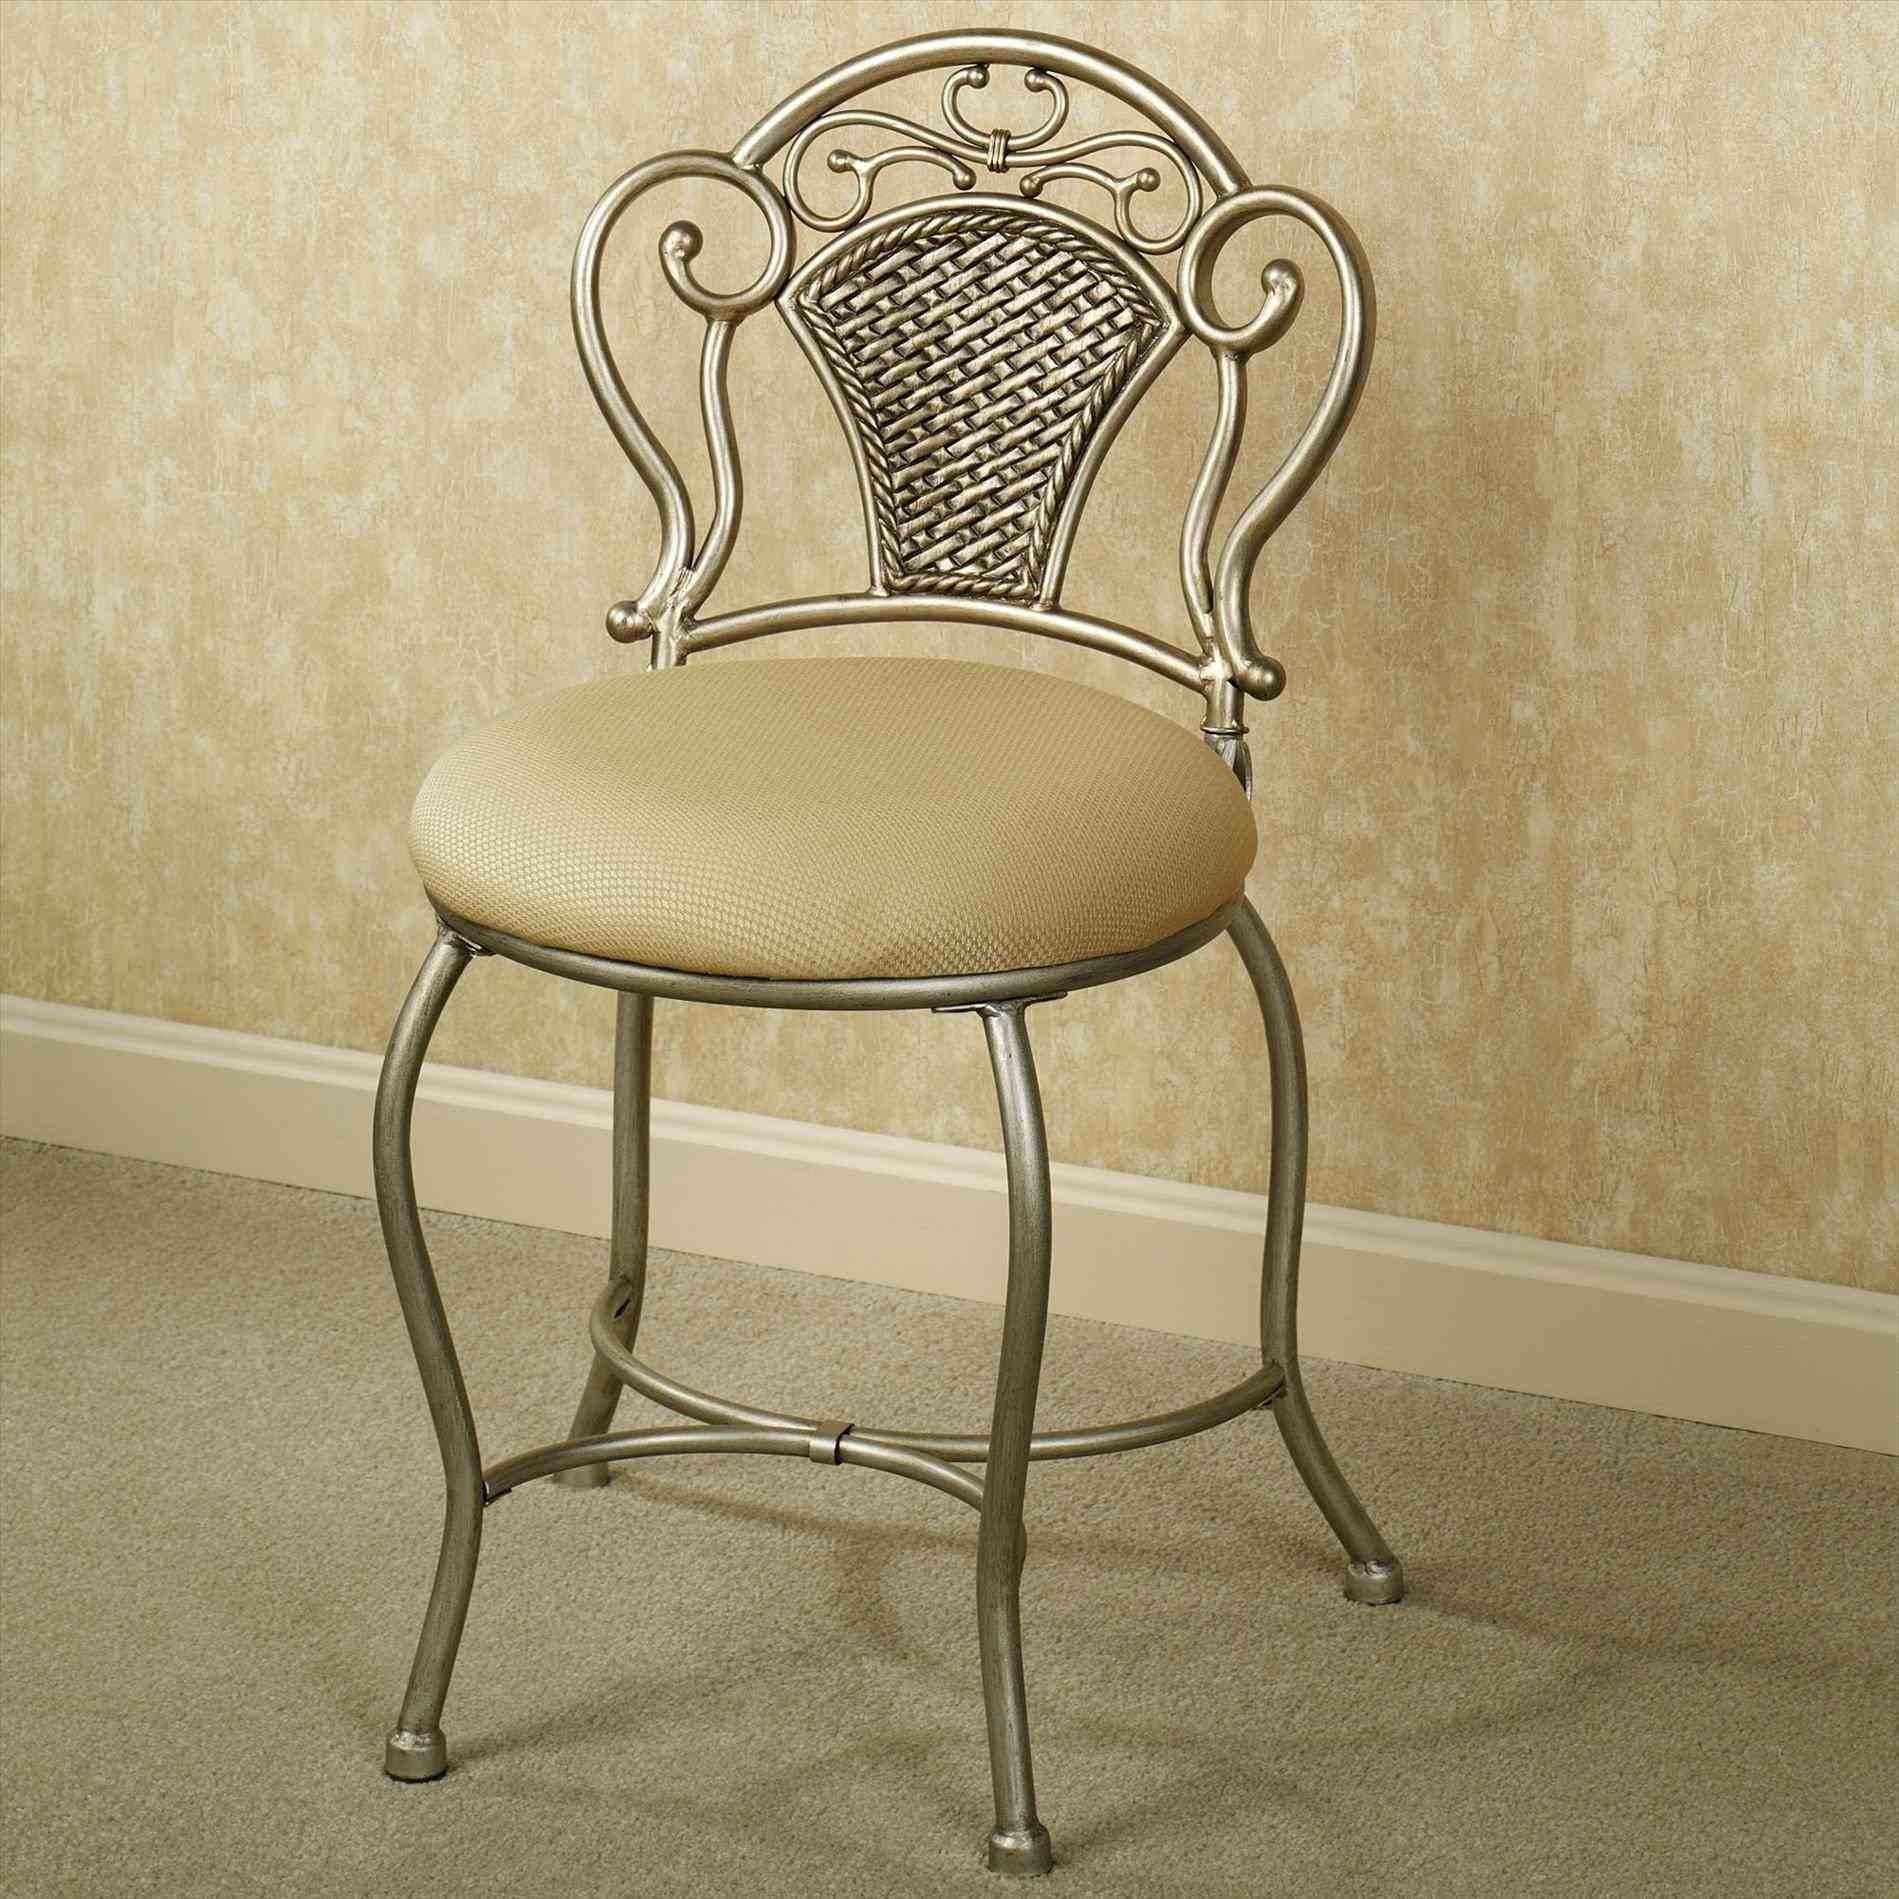 Vanity Chairs for Bathroom Excellent Bathroom Vanity Seat Ideas